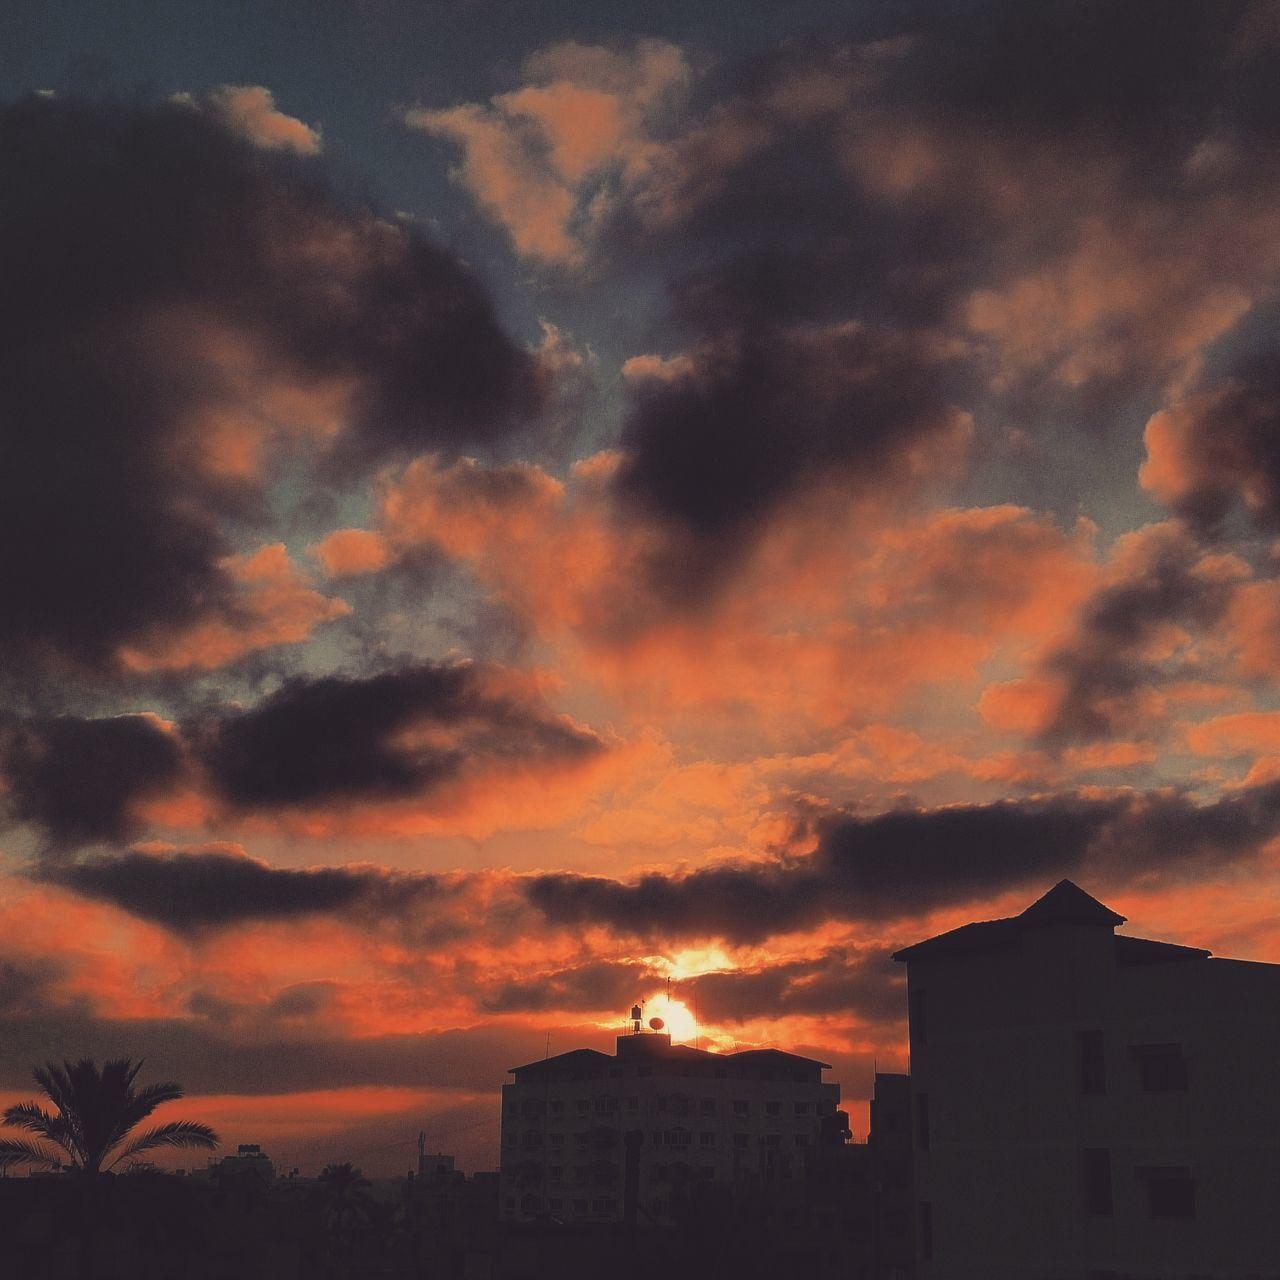 Popular Follow #f4f #followme #TagsForLikes #TFLers #followforfollow #follow4follow #teamfollowback #followher #followbackteam #followh Sunshine Sunrise Sunset Followme Like Nature Photography Landscspe Eyeem Collection Enjoying Life Fresh On Eyeem  Palestine Follow